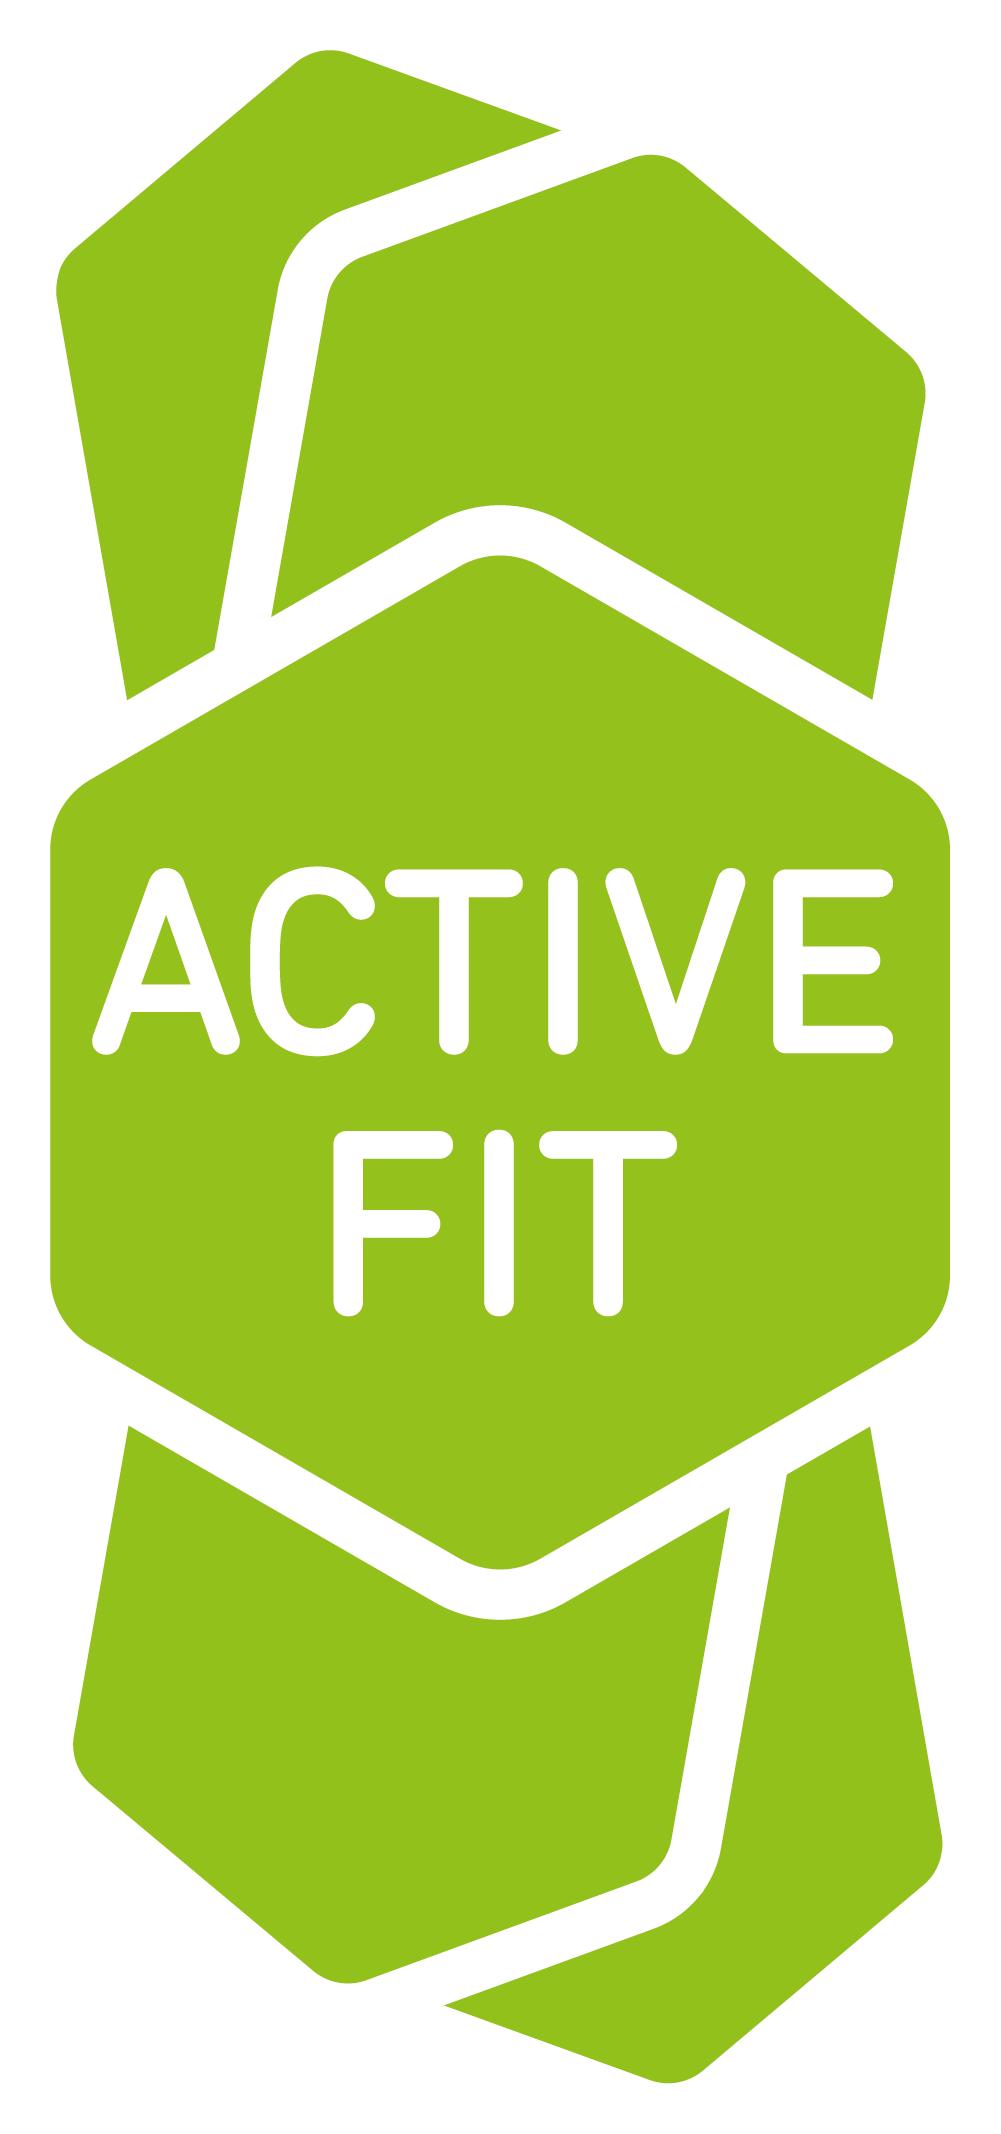 DEUTER_Mochila_Icono_Active Comfort Fit_Deportes_Koala_Madrid_Montaña-Trekking-Excursionismo-Alpinismo